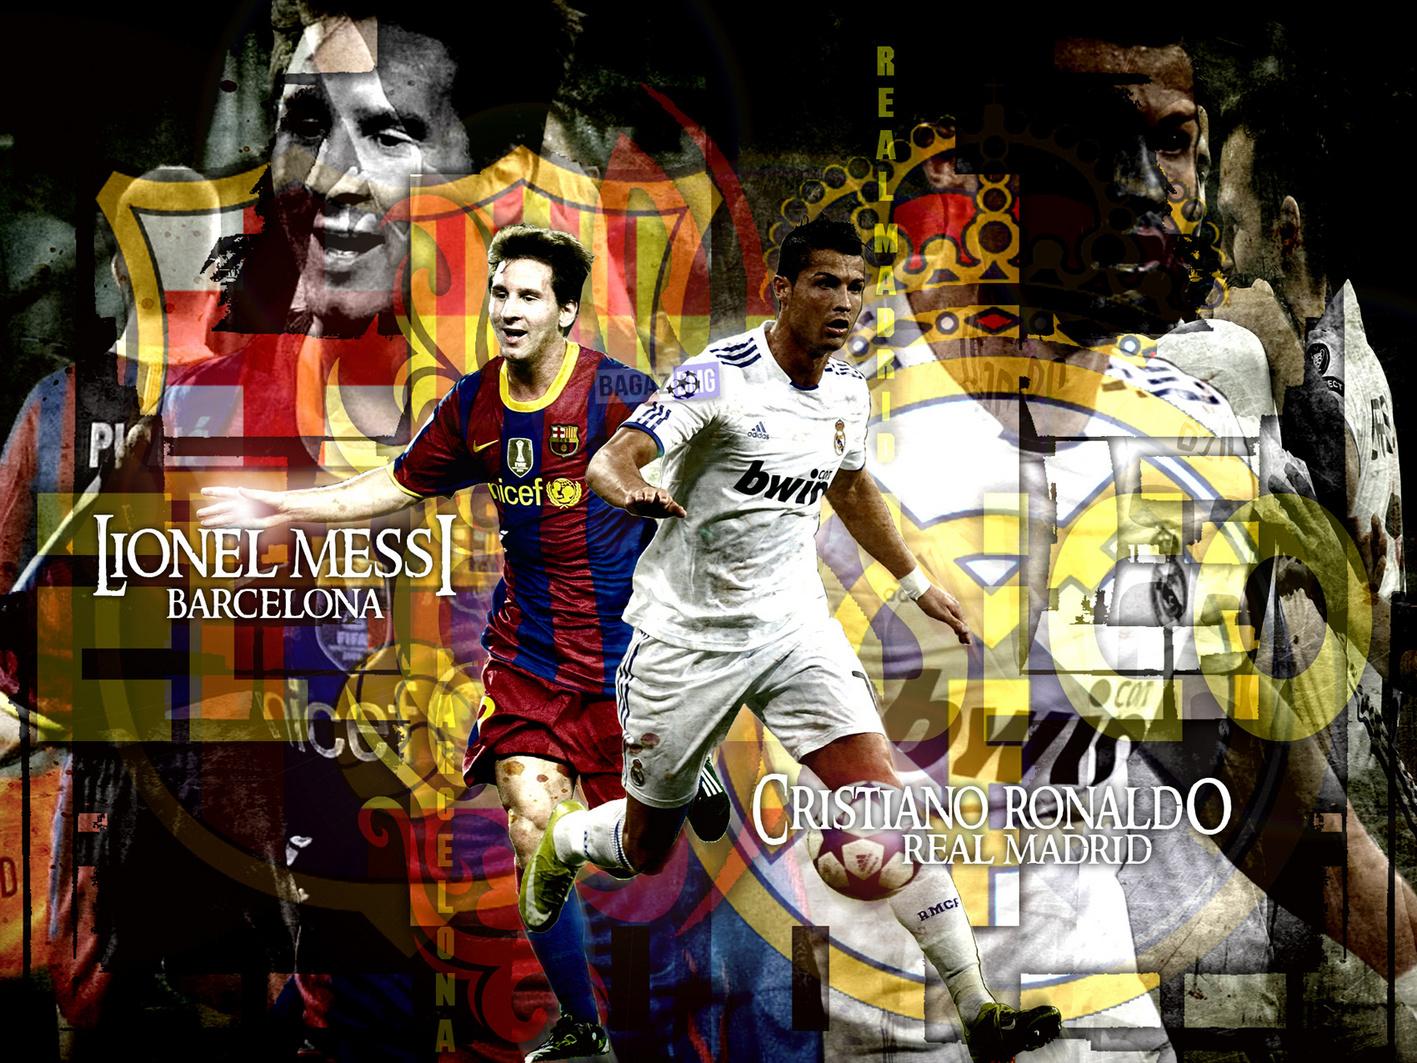 http://1.bp.blogspot.com/-aCRJ66KNE8E/ULIjJekGS0I/AAAAAAAAHw8/E-L4x3s8Mlk/s1600/Cristiano+Ronaldo+vs+Lionel+Messi+wallpaper+2012-2013+12.jpg